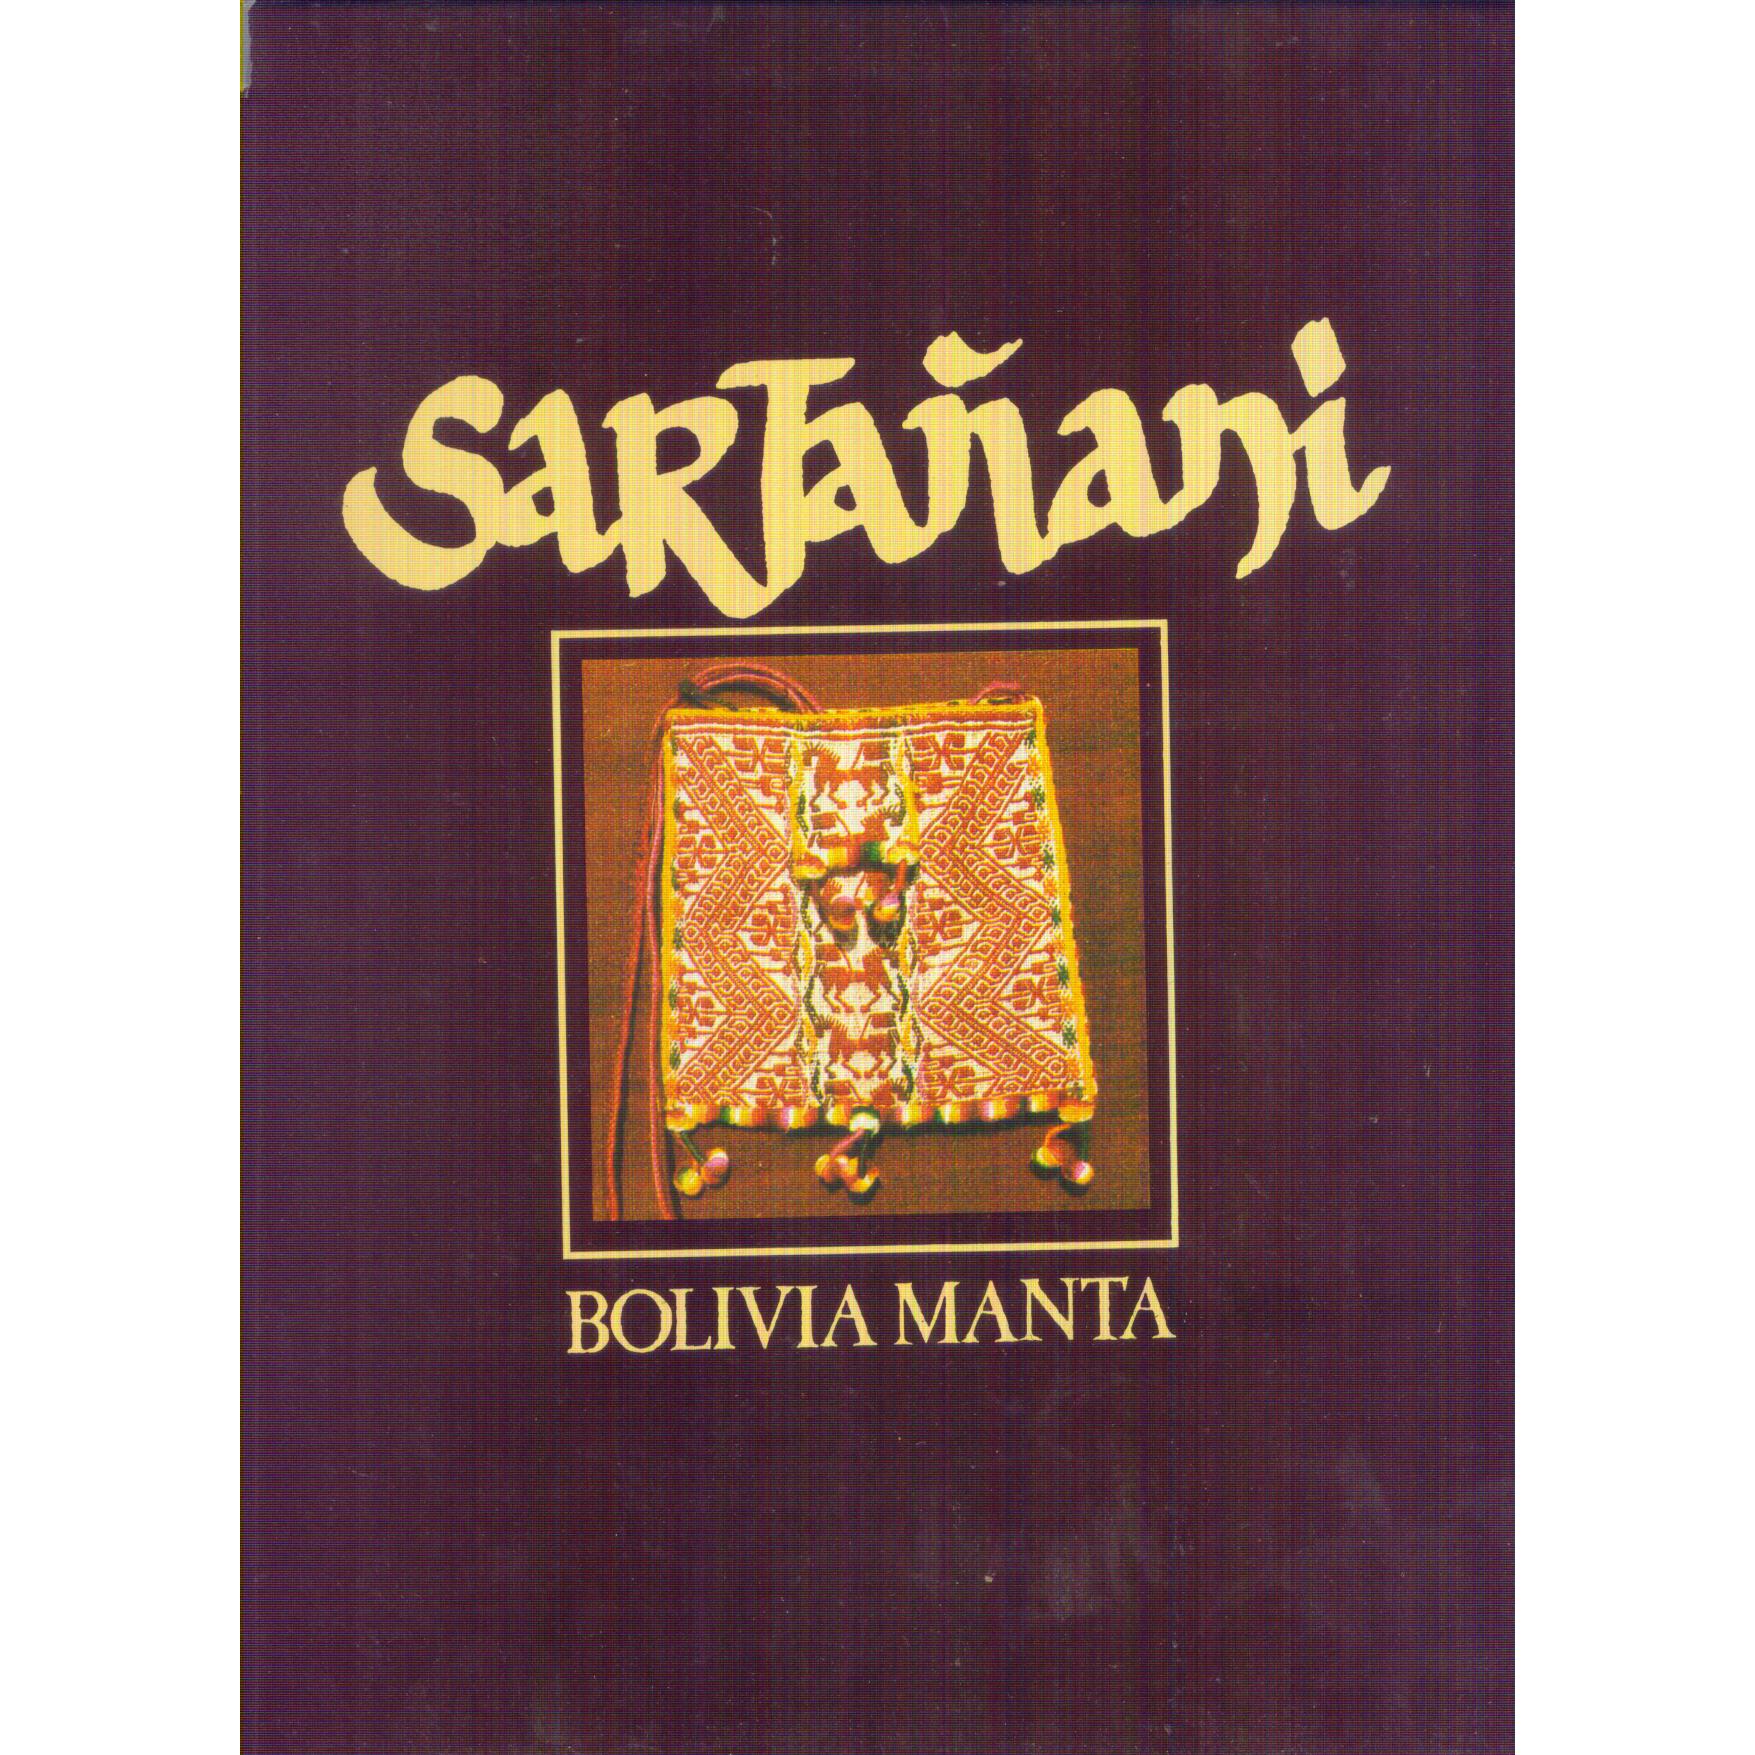 BOLIVIA MANTA SARTANANI